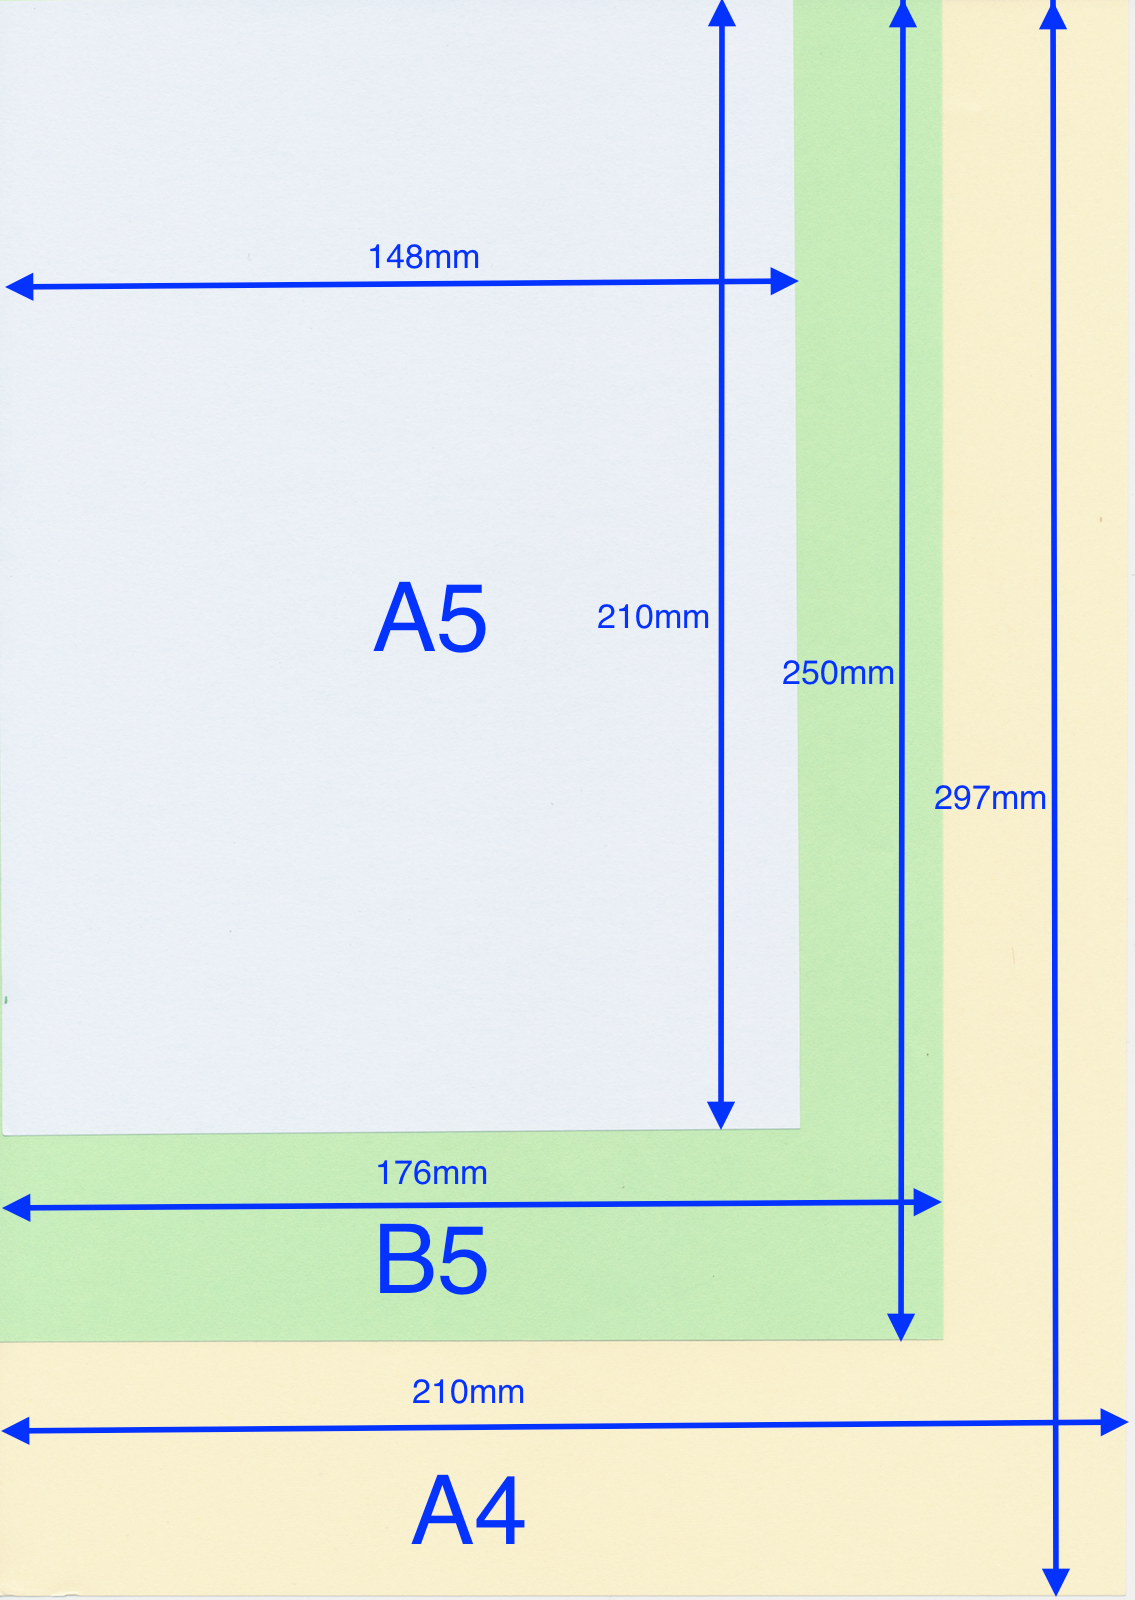 a5 dimensions